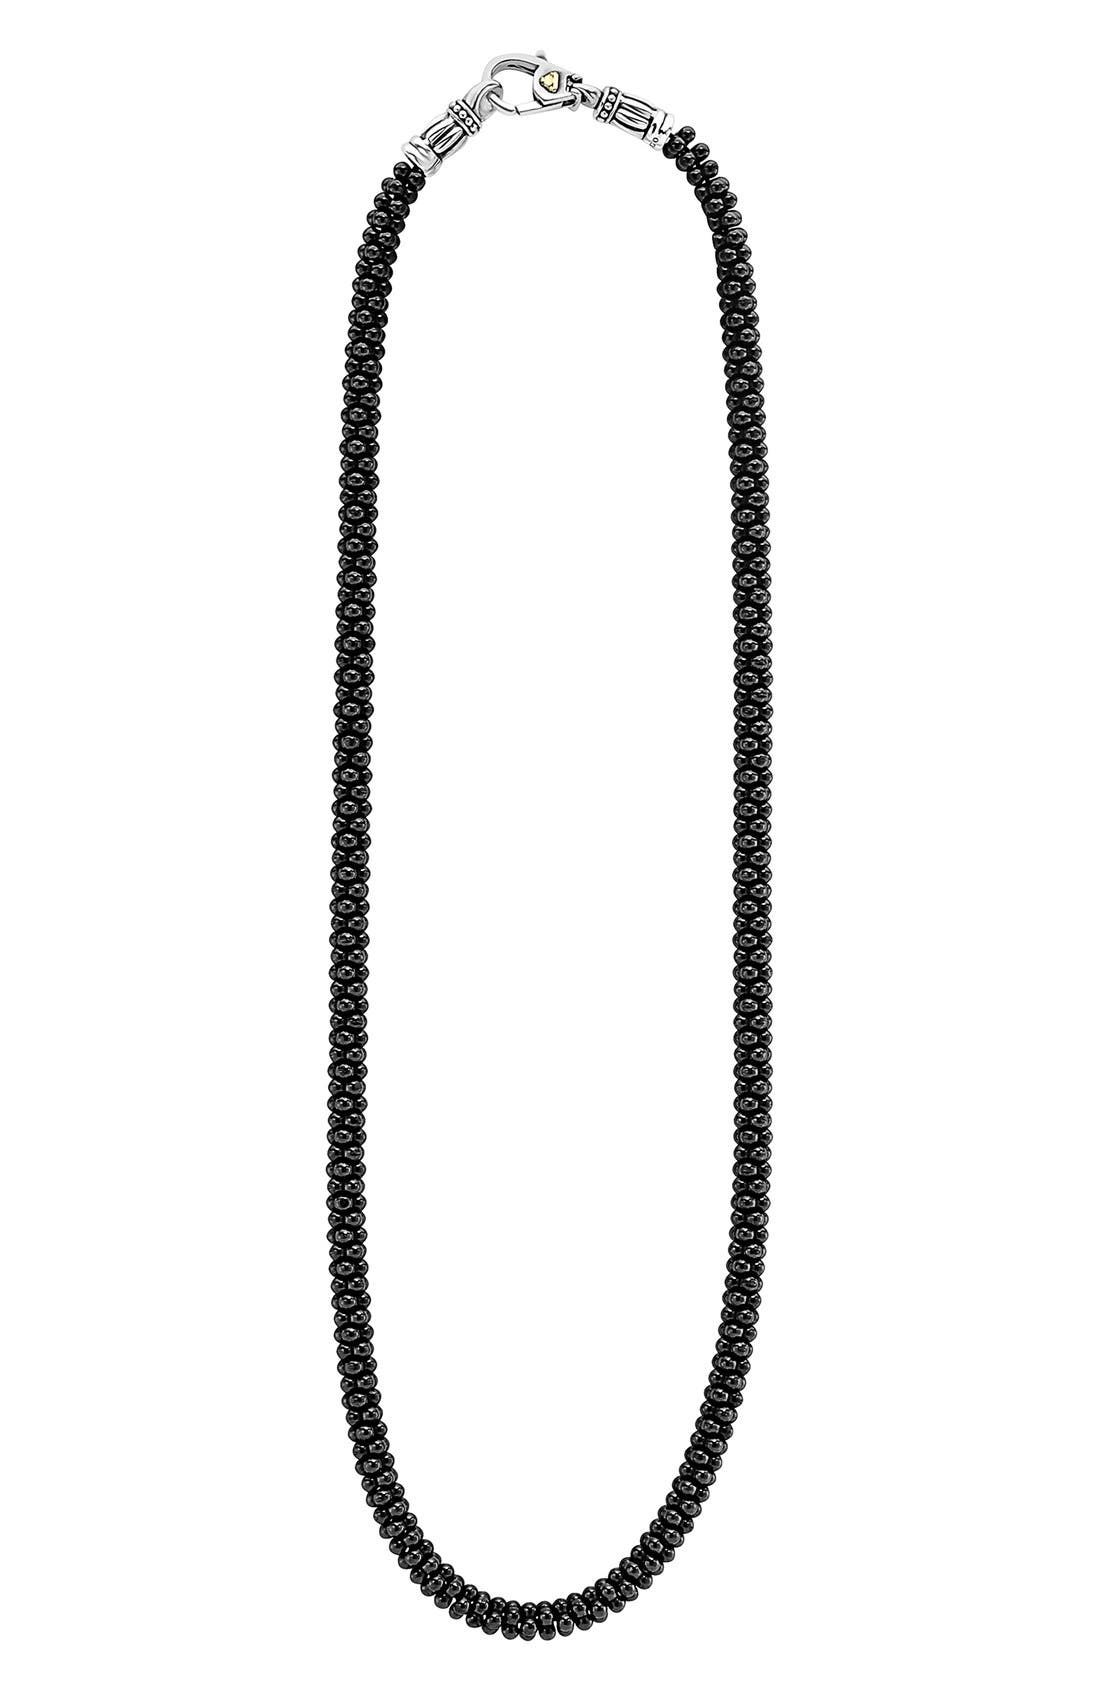 'Black Caviar' 5mm Beaded Necklace,                             Main thumbnail 1, color,                             BLACK CAVIAR